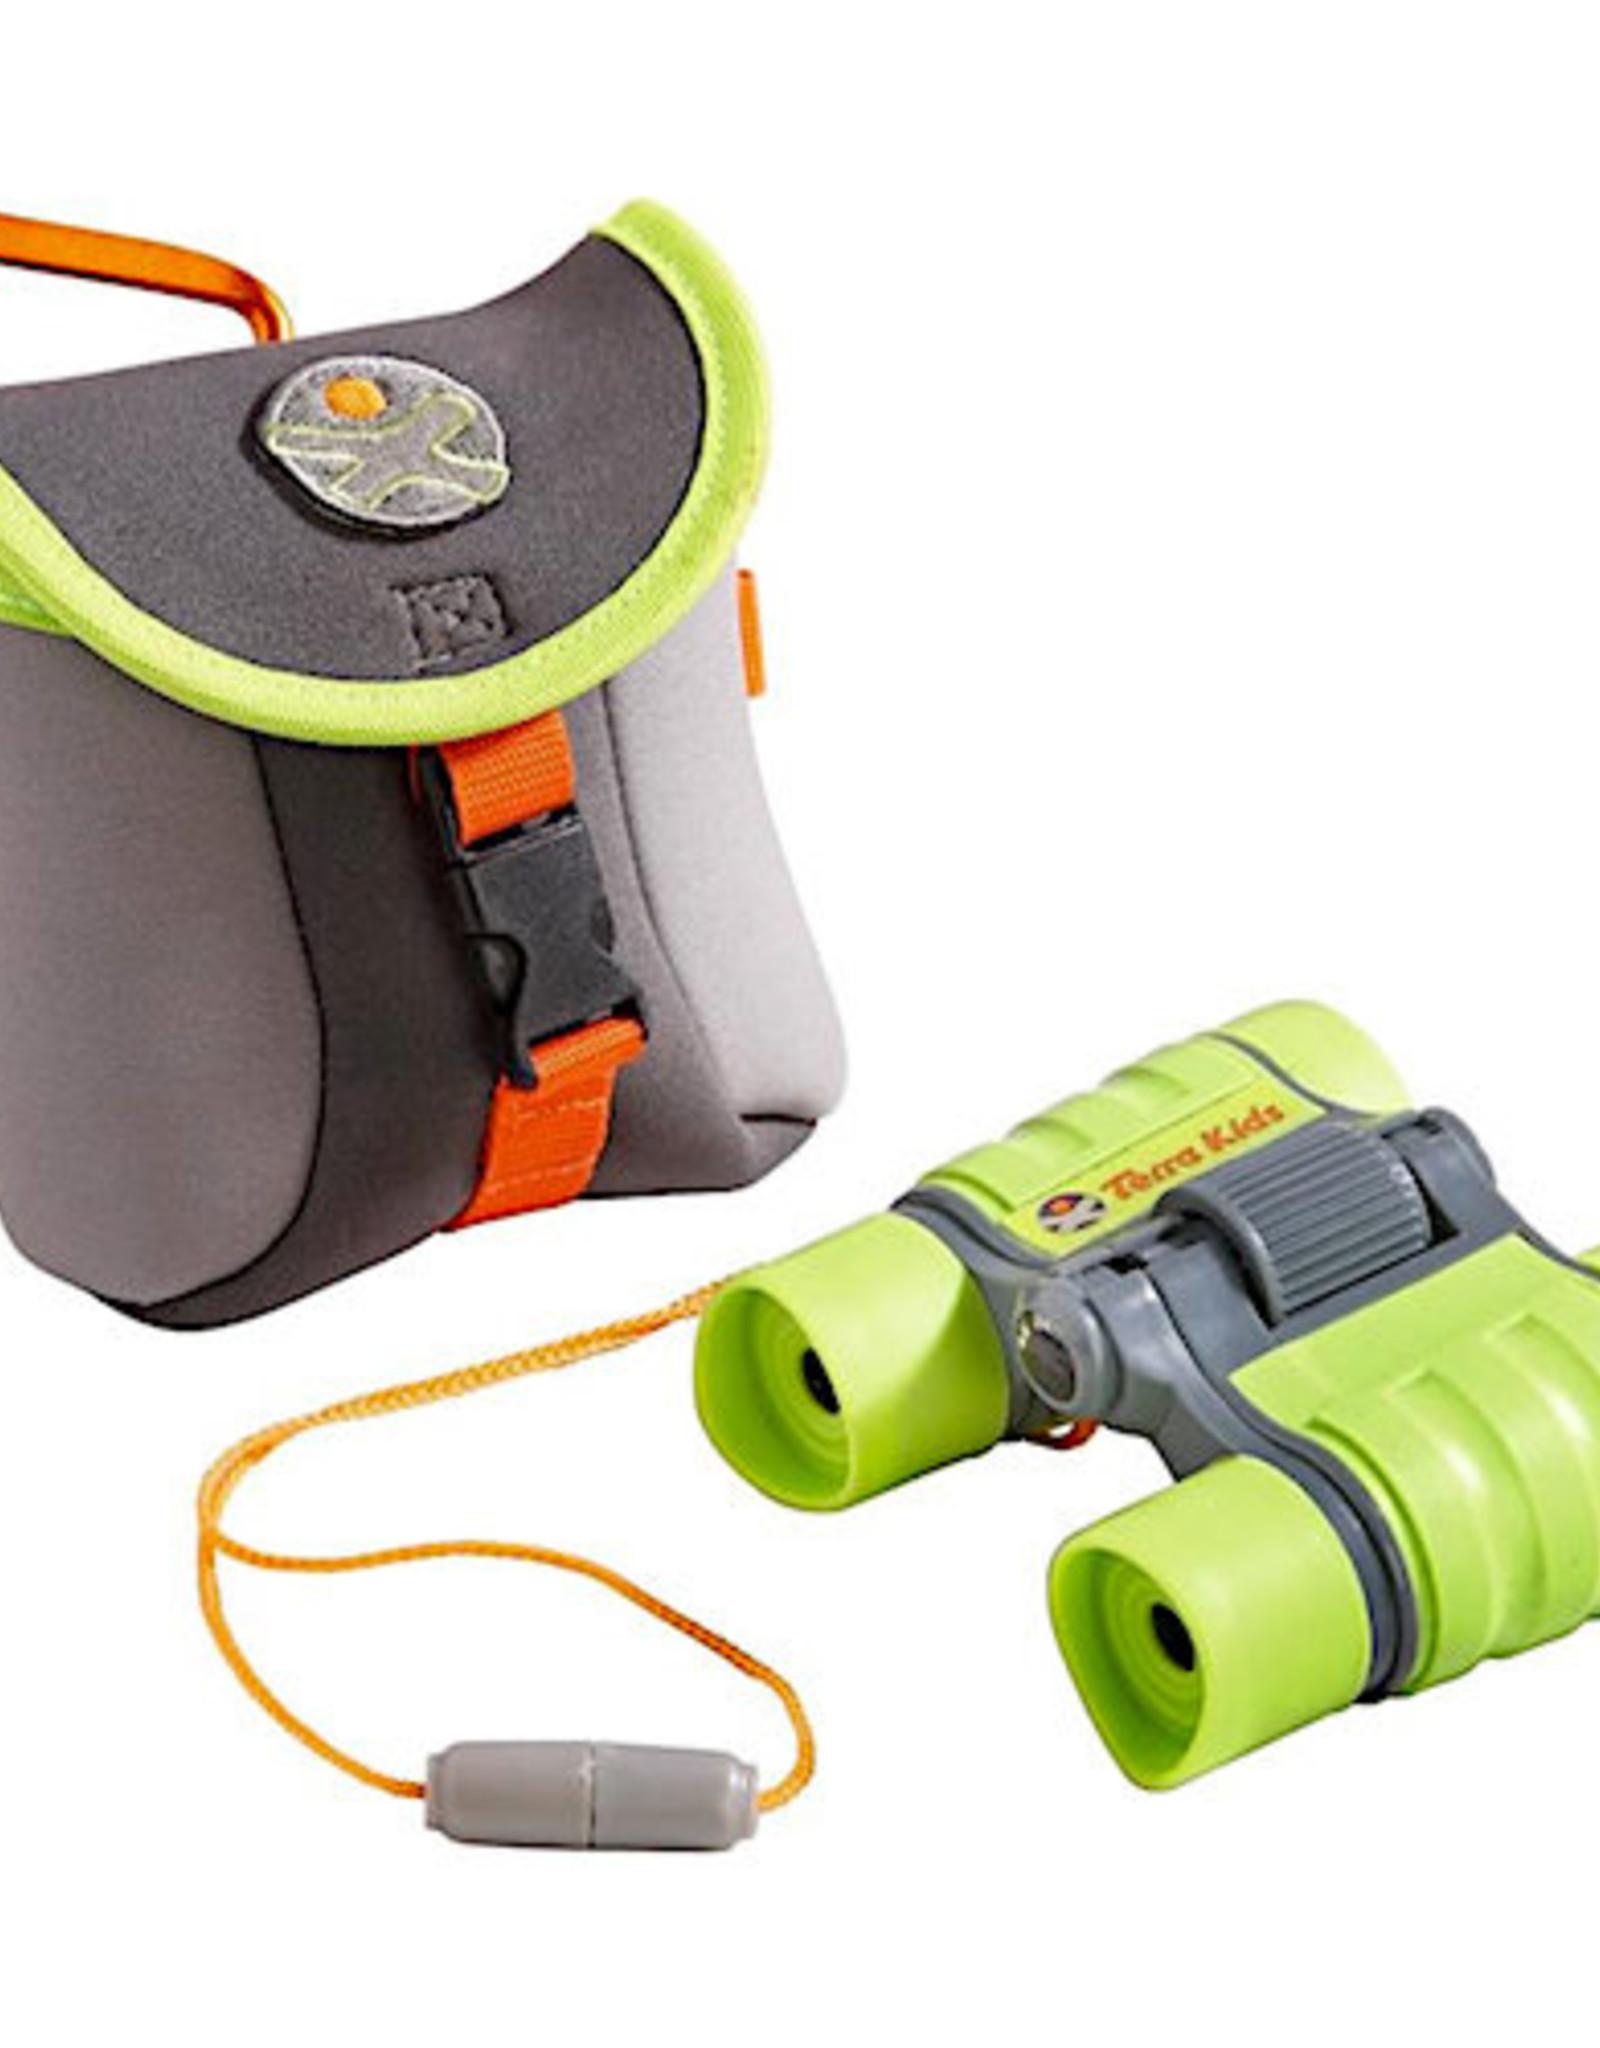 Terra Kids - Binoculars with Bag